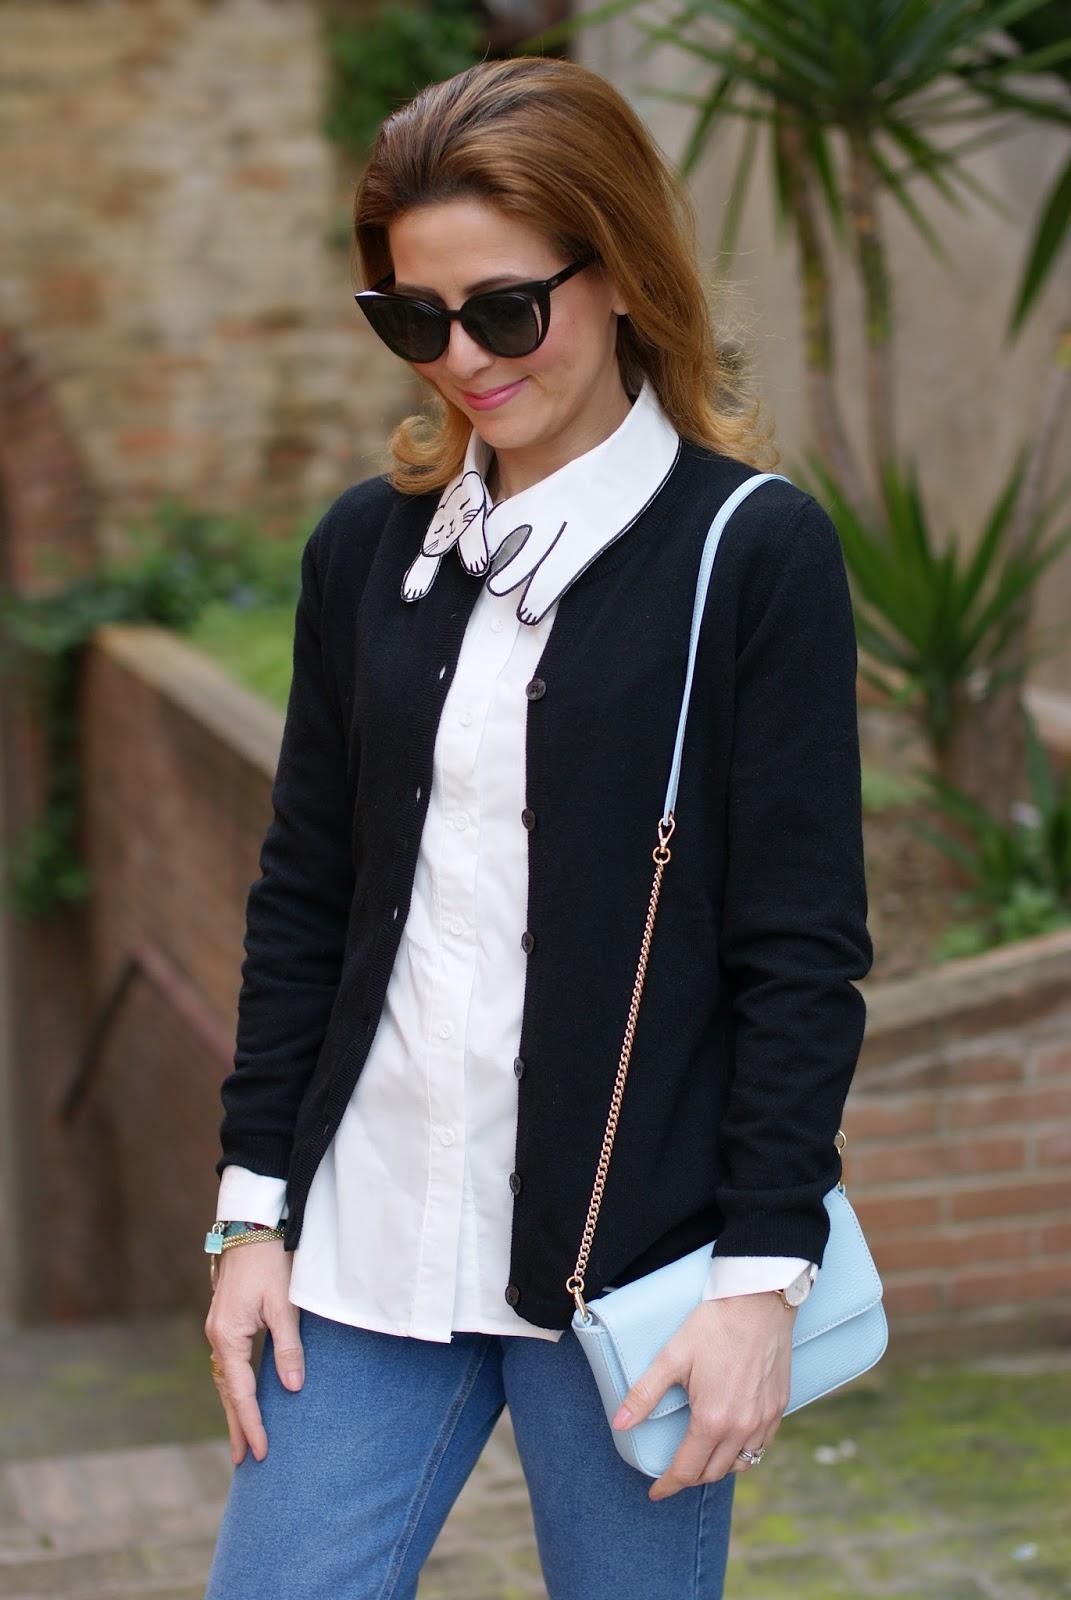 White cat collar shirt, Fendi sunglasses on Fashion and Cookies fashion blog, fashion blogger style